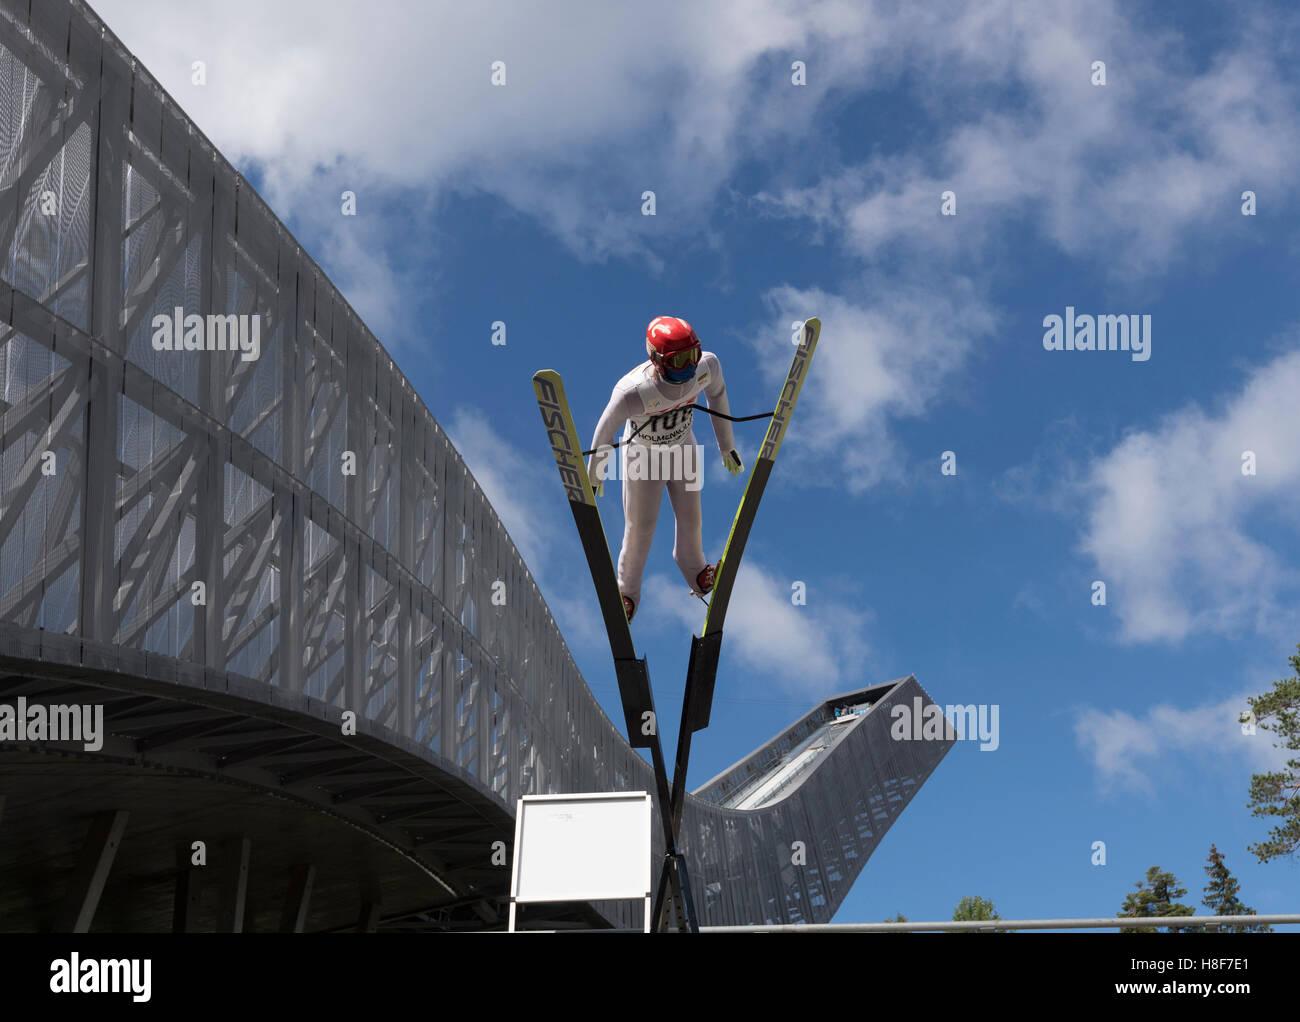 Ski jumper, Holmenkollen, Oslo, Norway - Stock Image